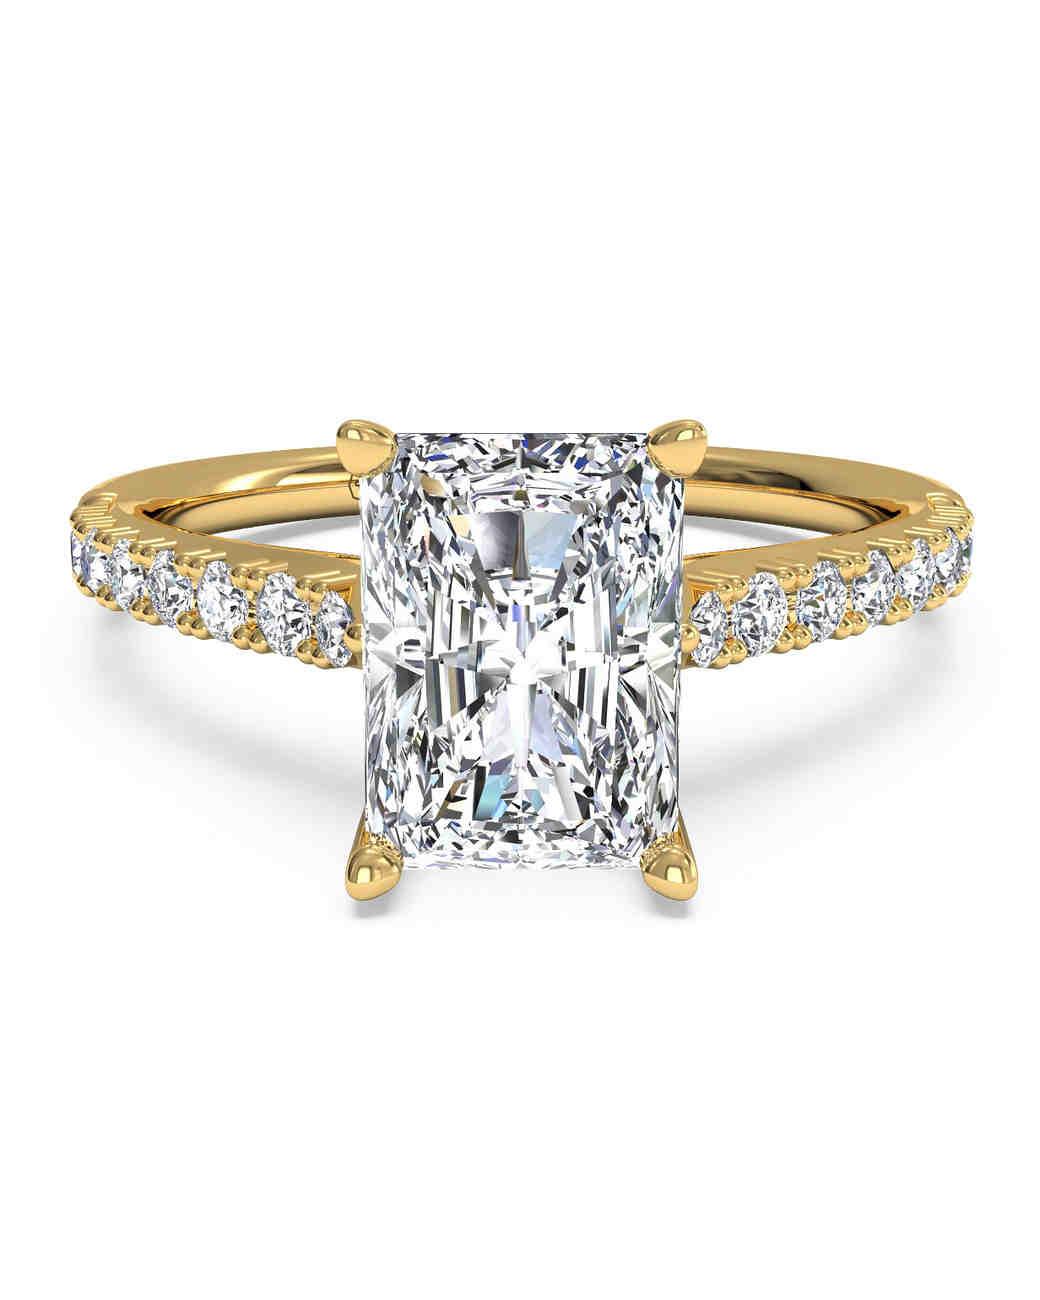 Ritani French-Set Diamond Band Yellow Gold Engagement Ring